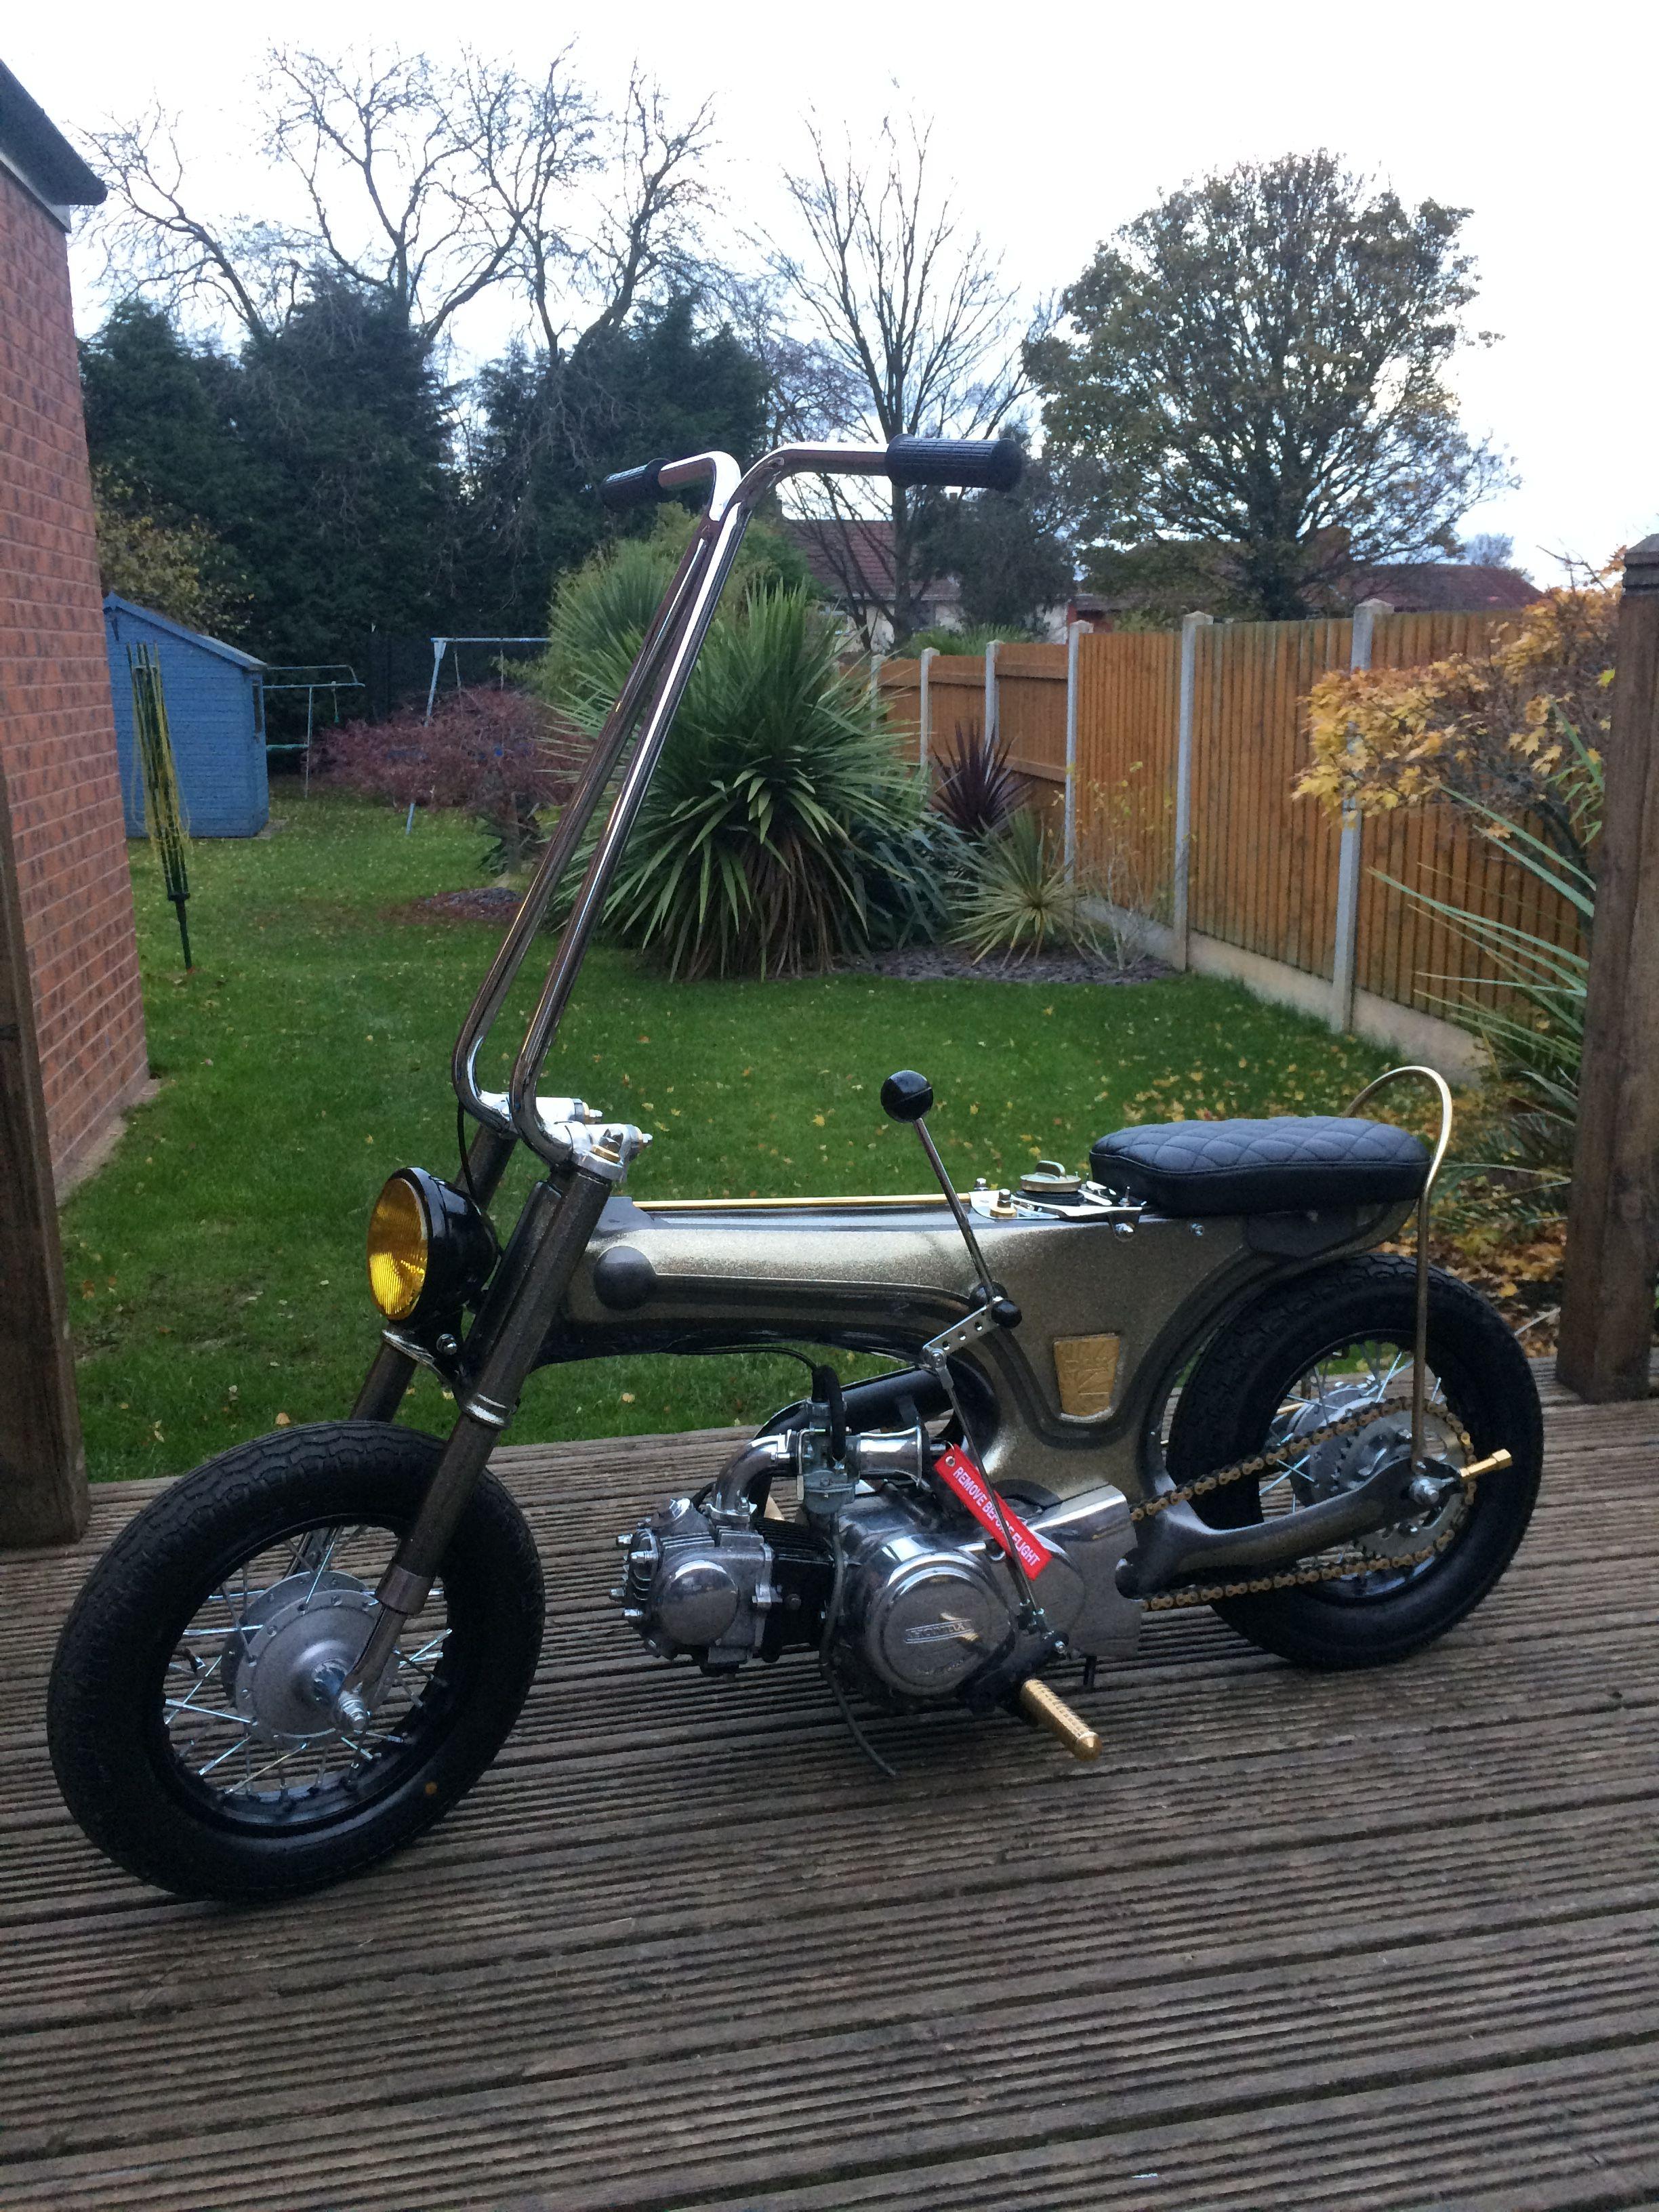 Pin By Fastwheels On Dax Chopper Mini Bike Mini Motorbike Moped Motorcycle